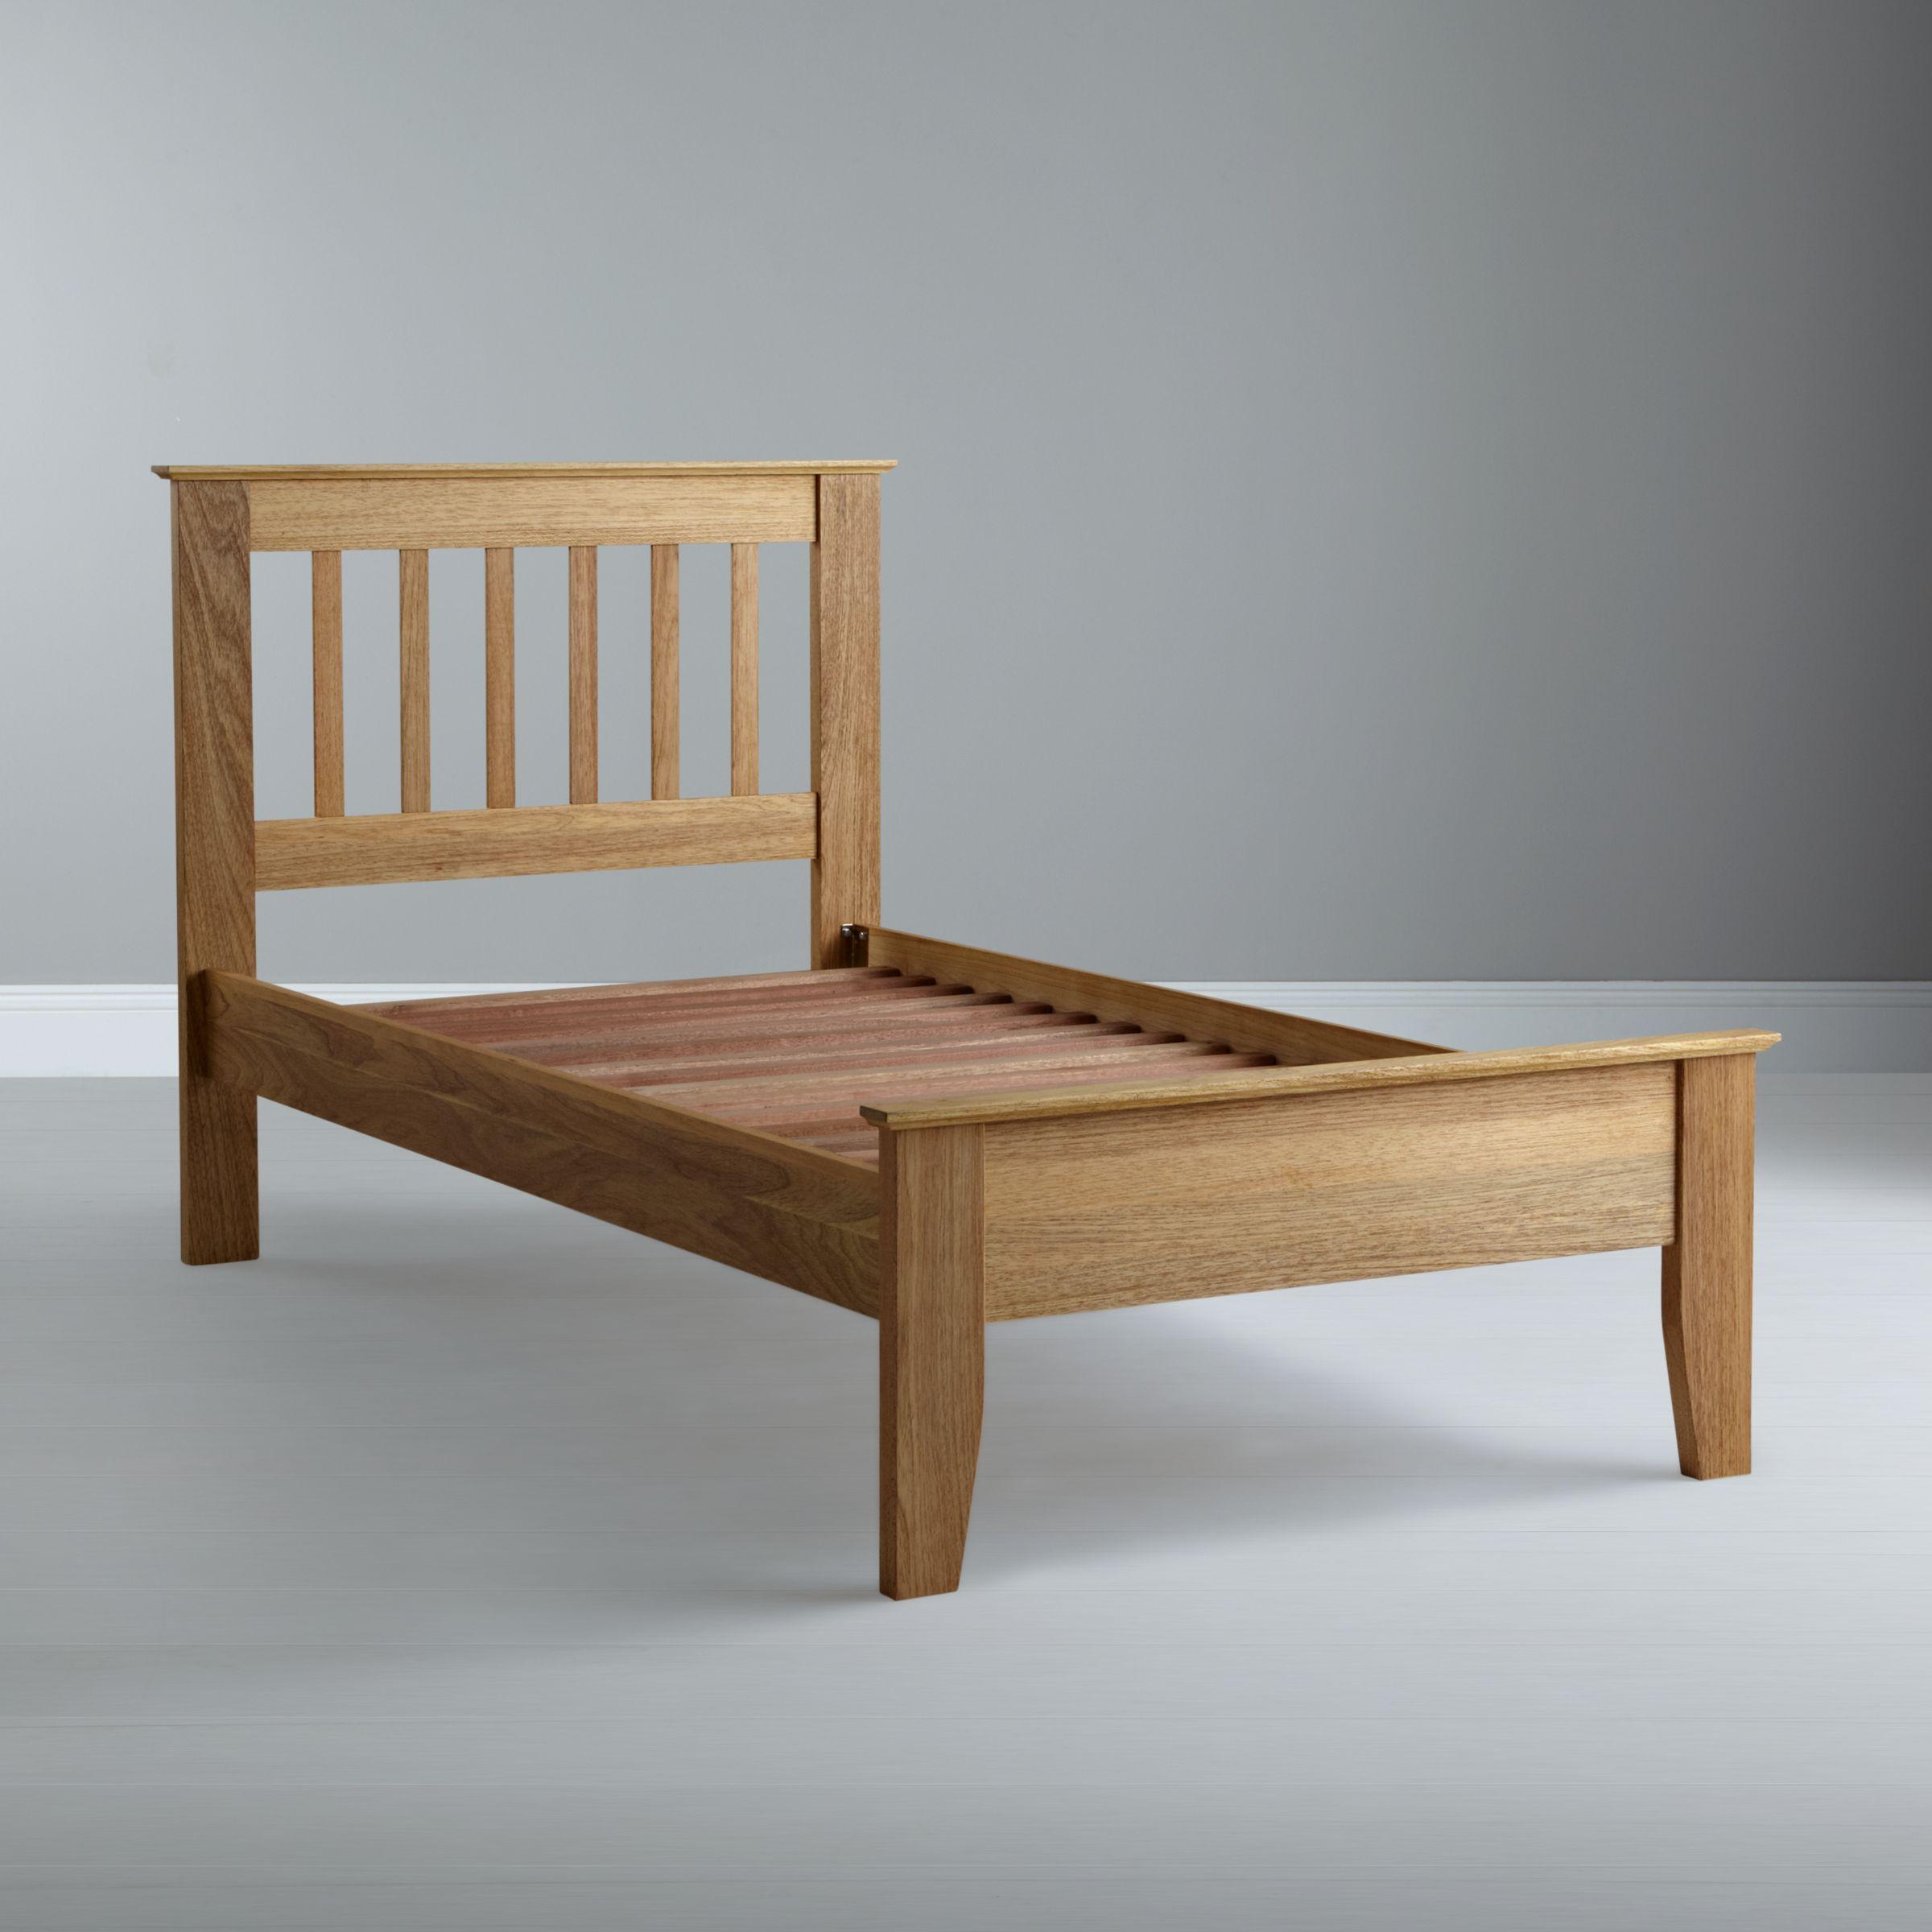 john lewis oak furniture : 230587485zoom from www.comparestoreprices.co.uk size 2400 x 2400 jpeg 257kB